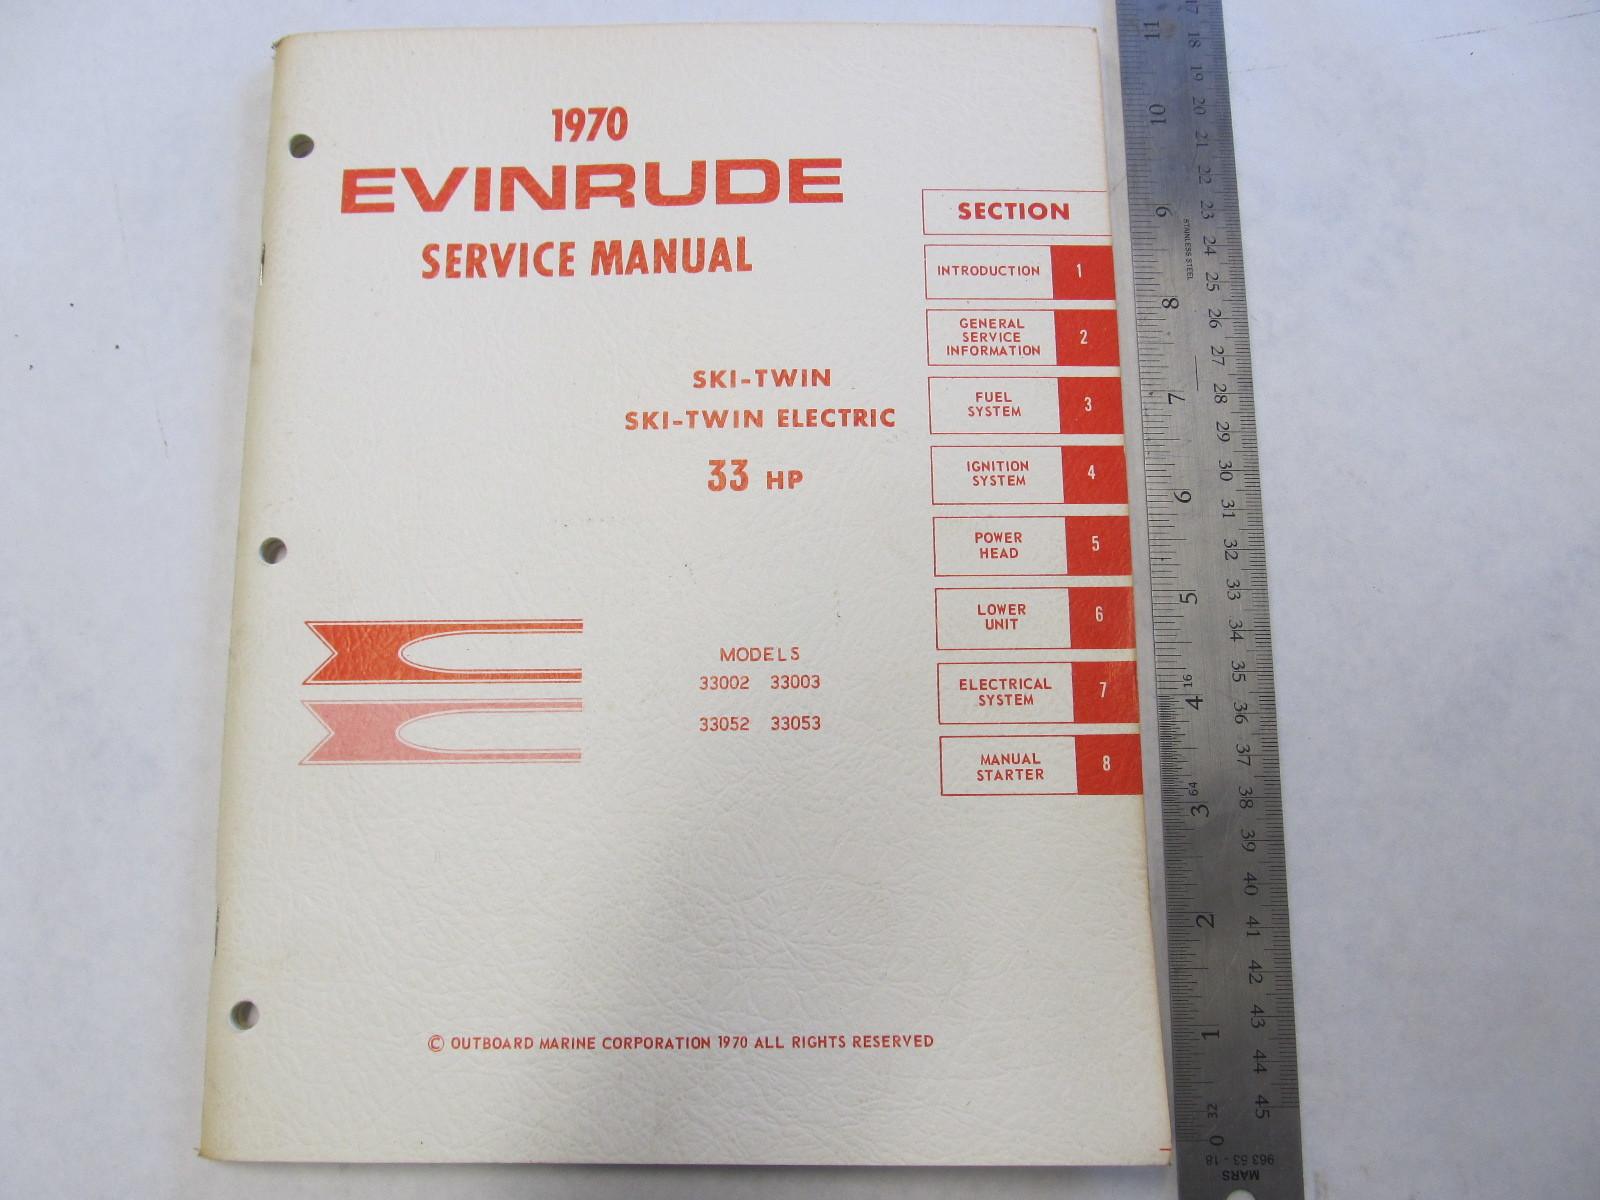 1970 evinrude outboard service manual 33 hp ski twin ski twin rh greenbayprop com 20 HP Evinrude 1958 20 HP Evinrude